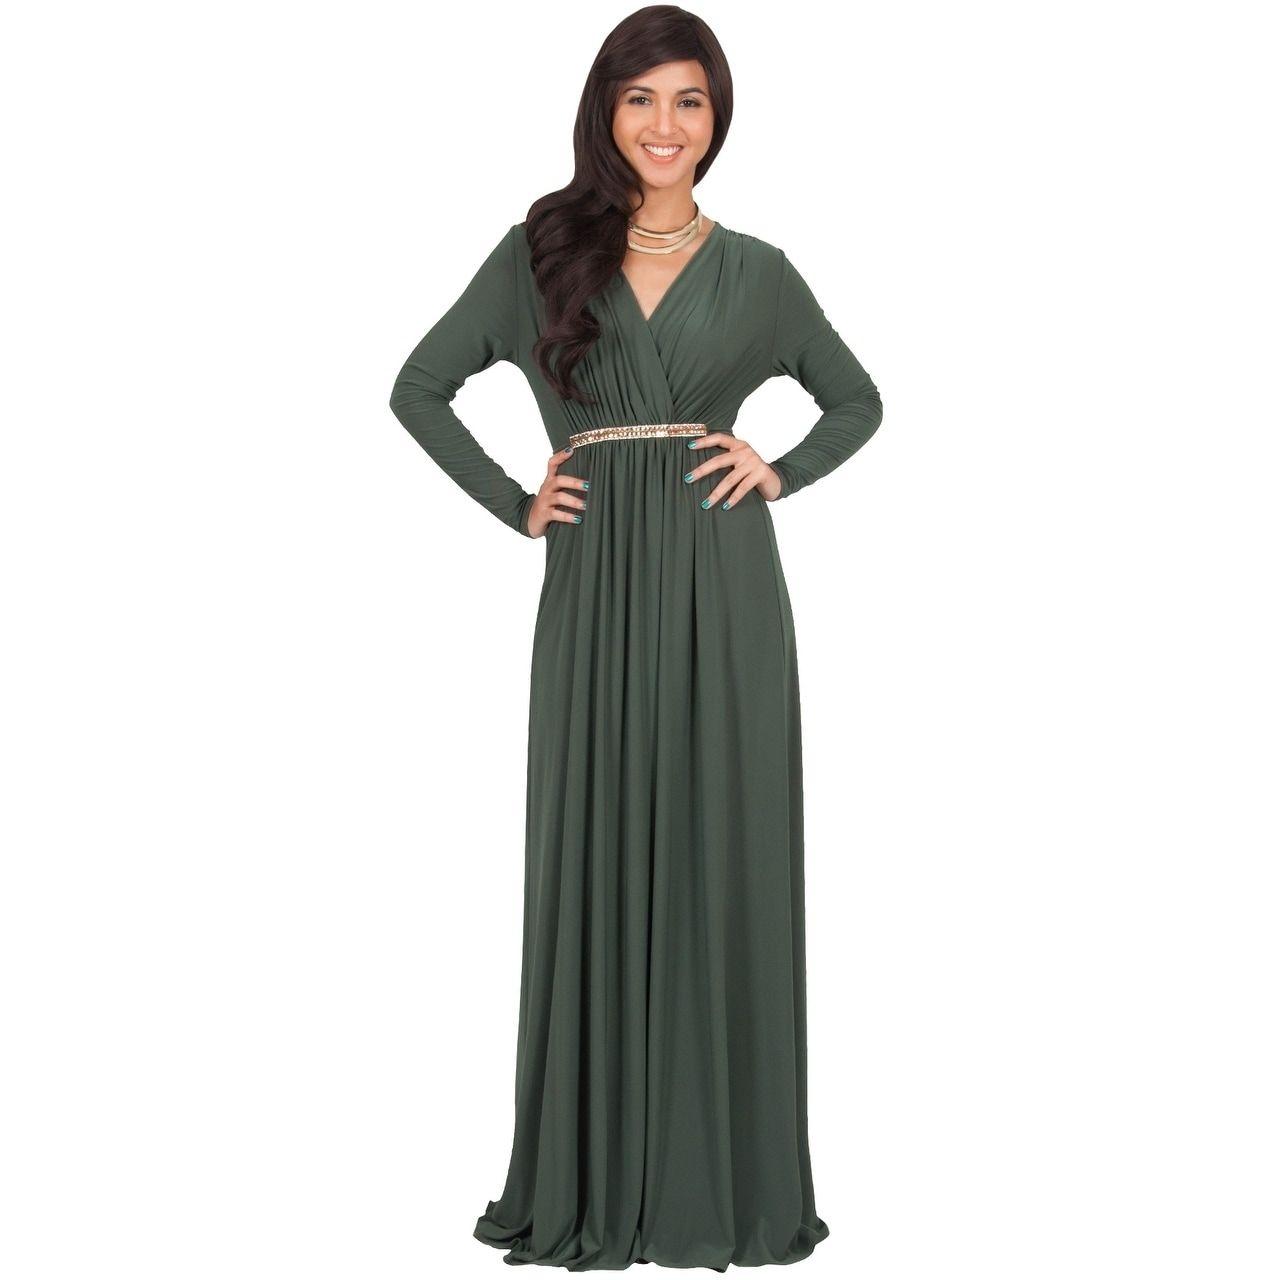 Koh koh womenus long sleeve caftan maxi dress with glamorous belt